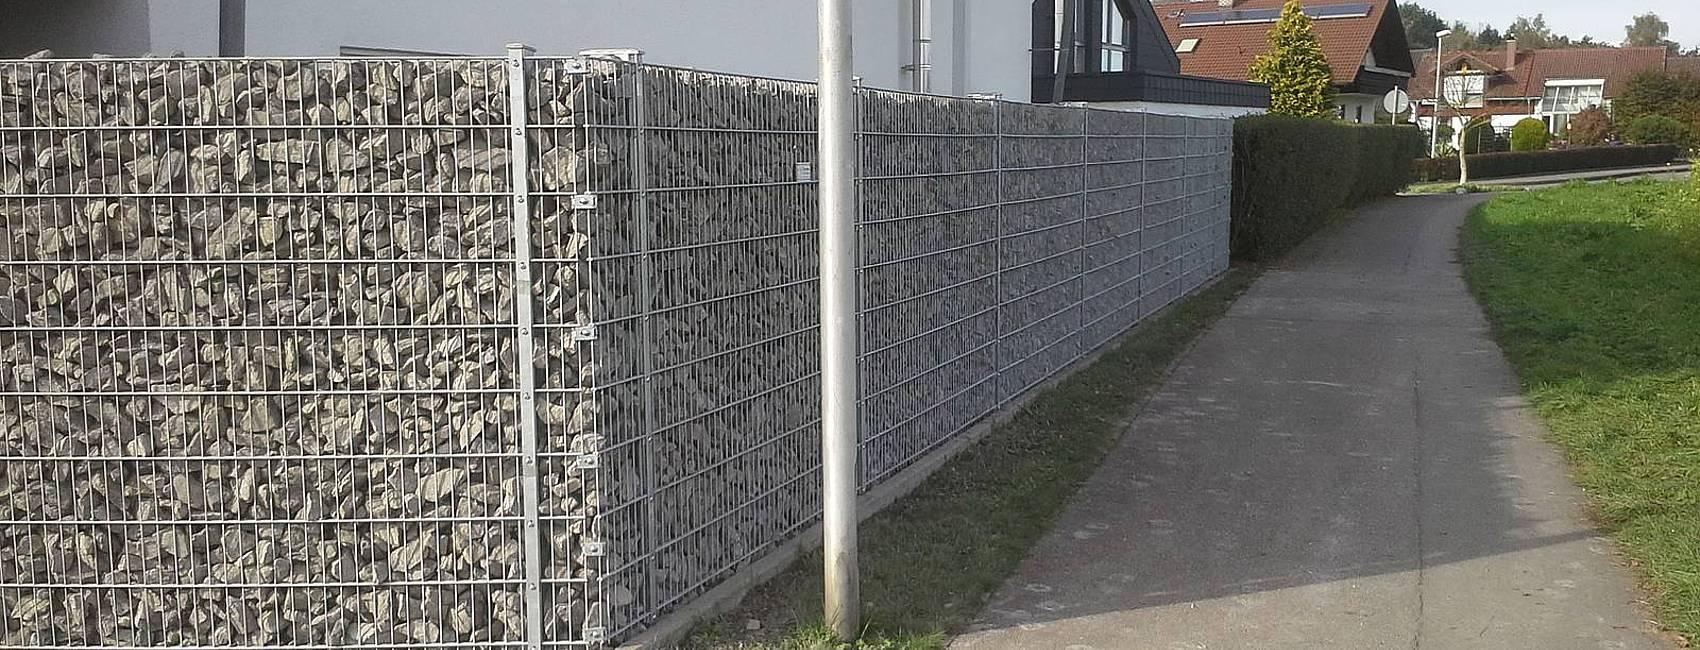 Zaun Belles Zaunbau Zaunmontage und Reperatur Sichtschutz